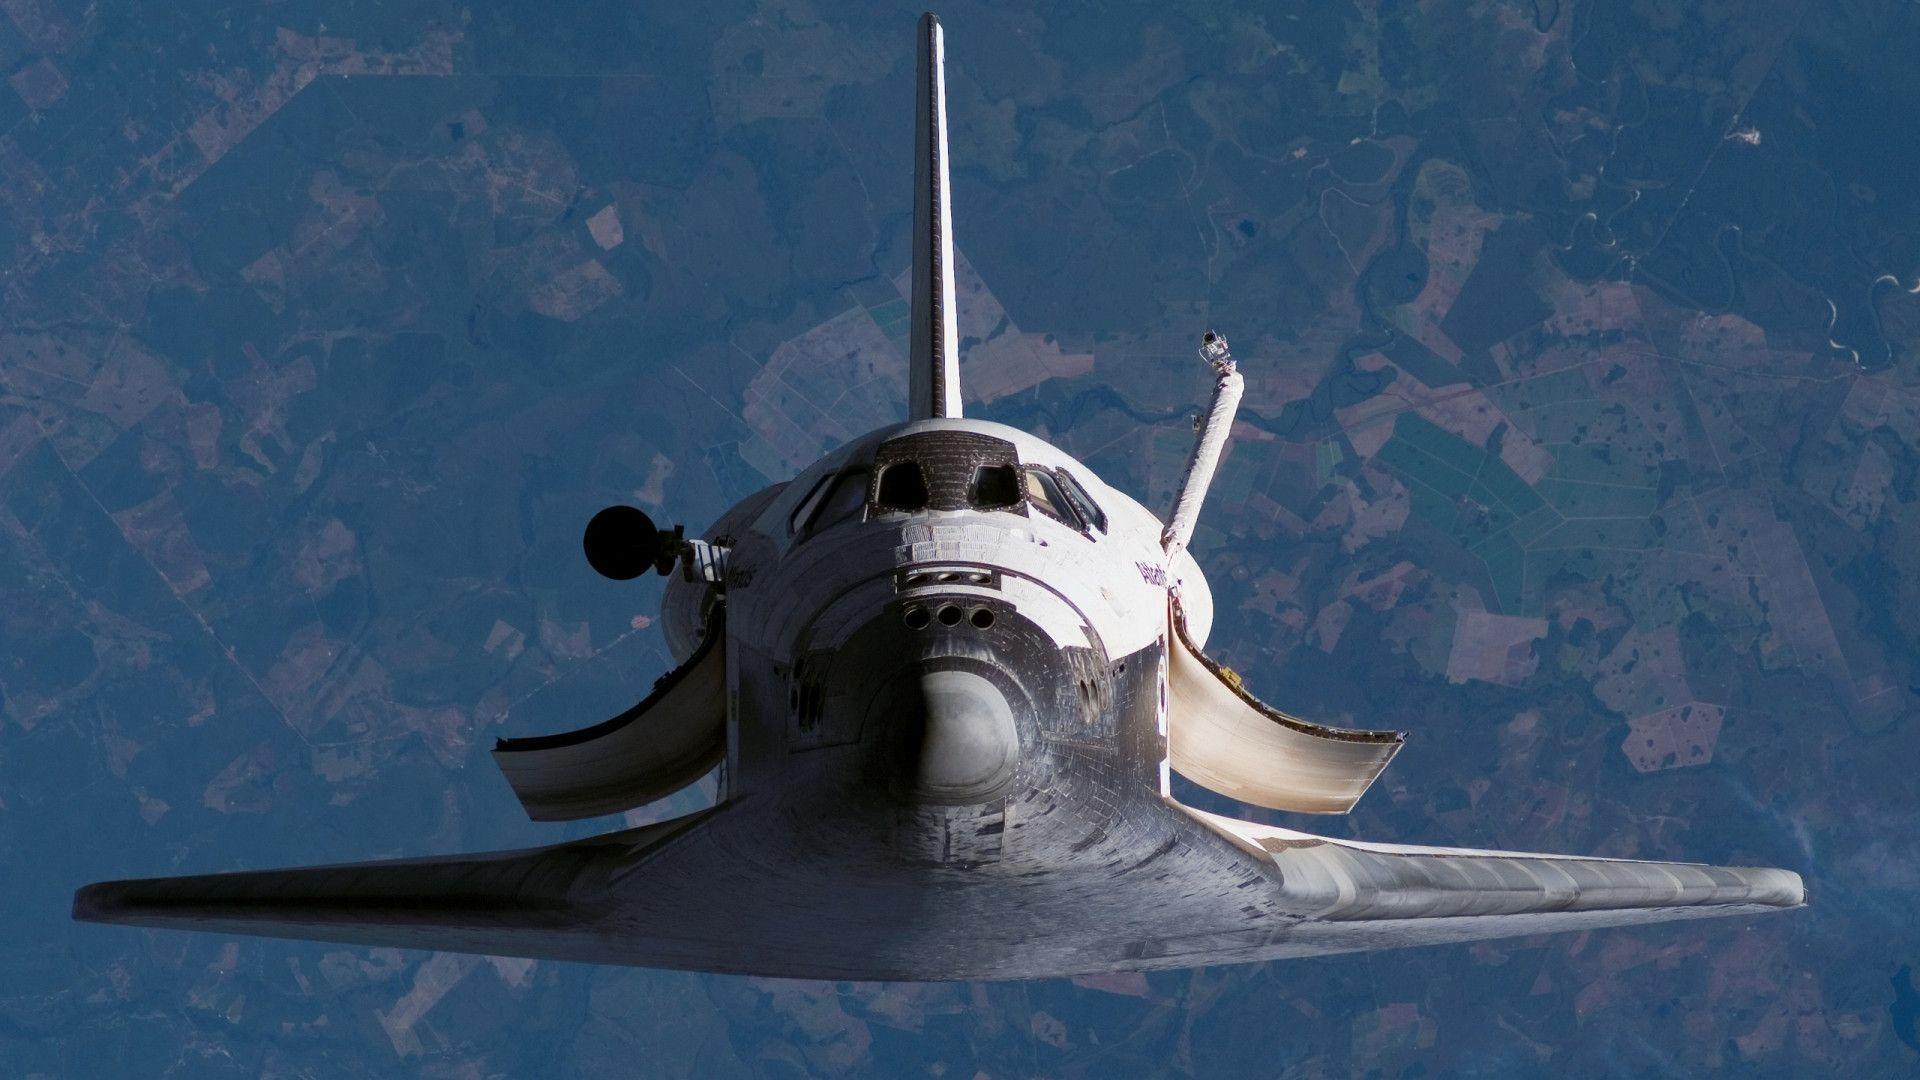 wallpaper spacewalk nasa - photo #34